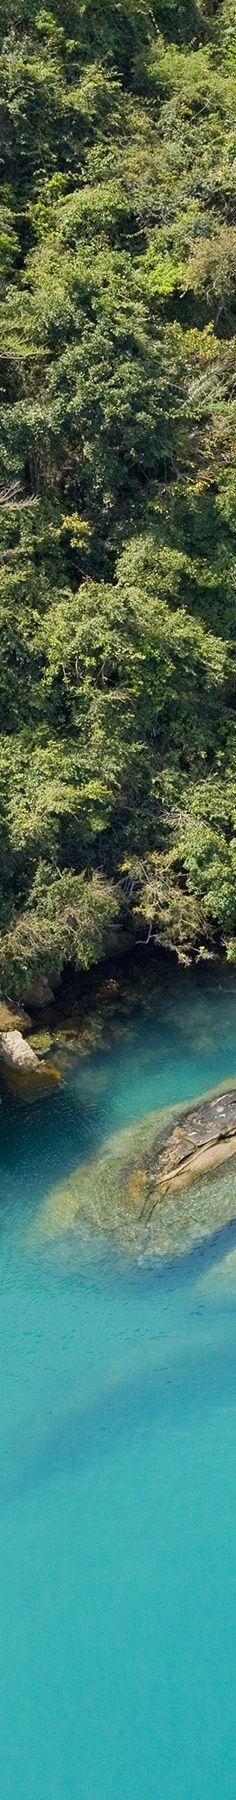 World Water Day - Dia Mundial da Água: Enseada de Parati-Mirim, Parati, parte 1 de 4